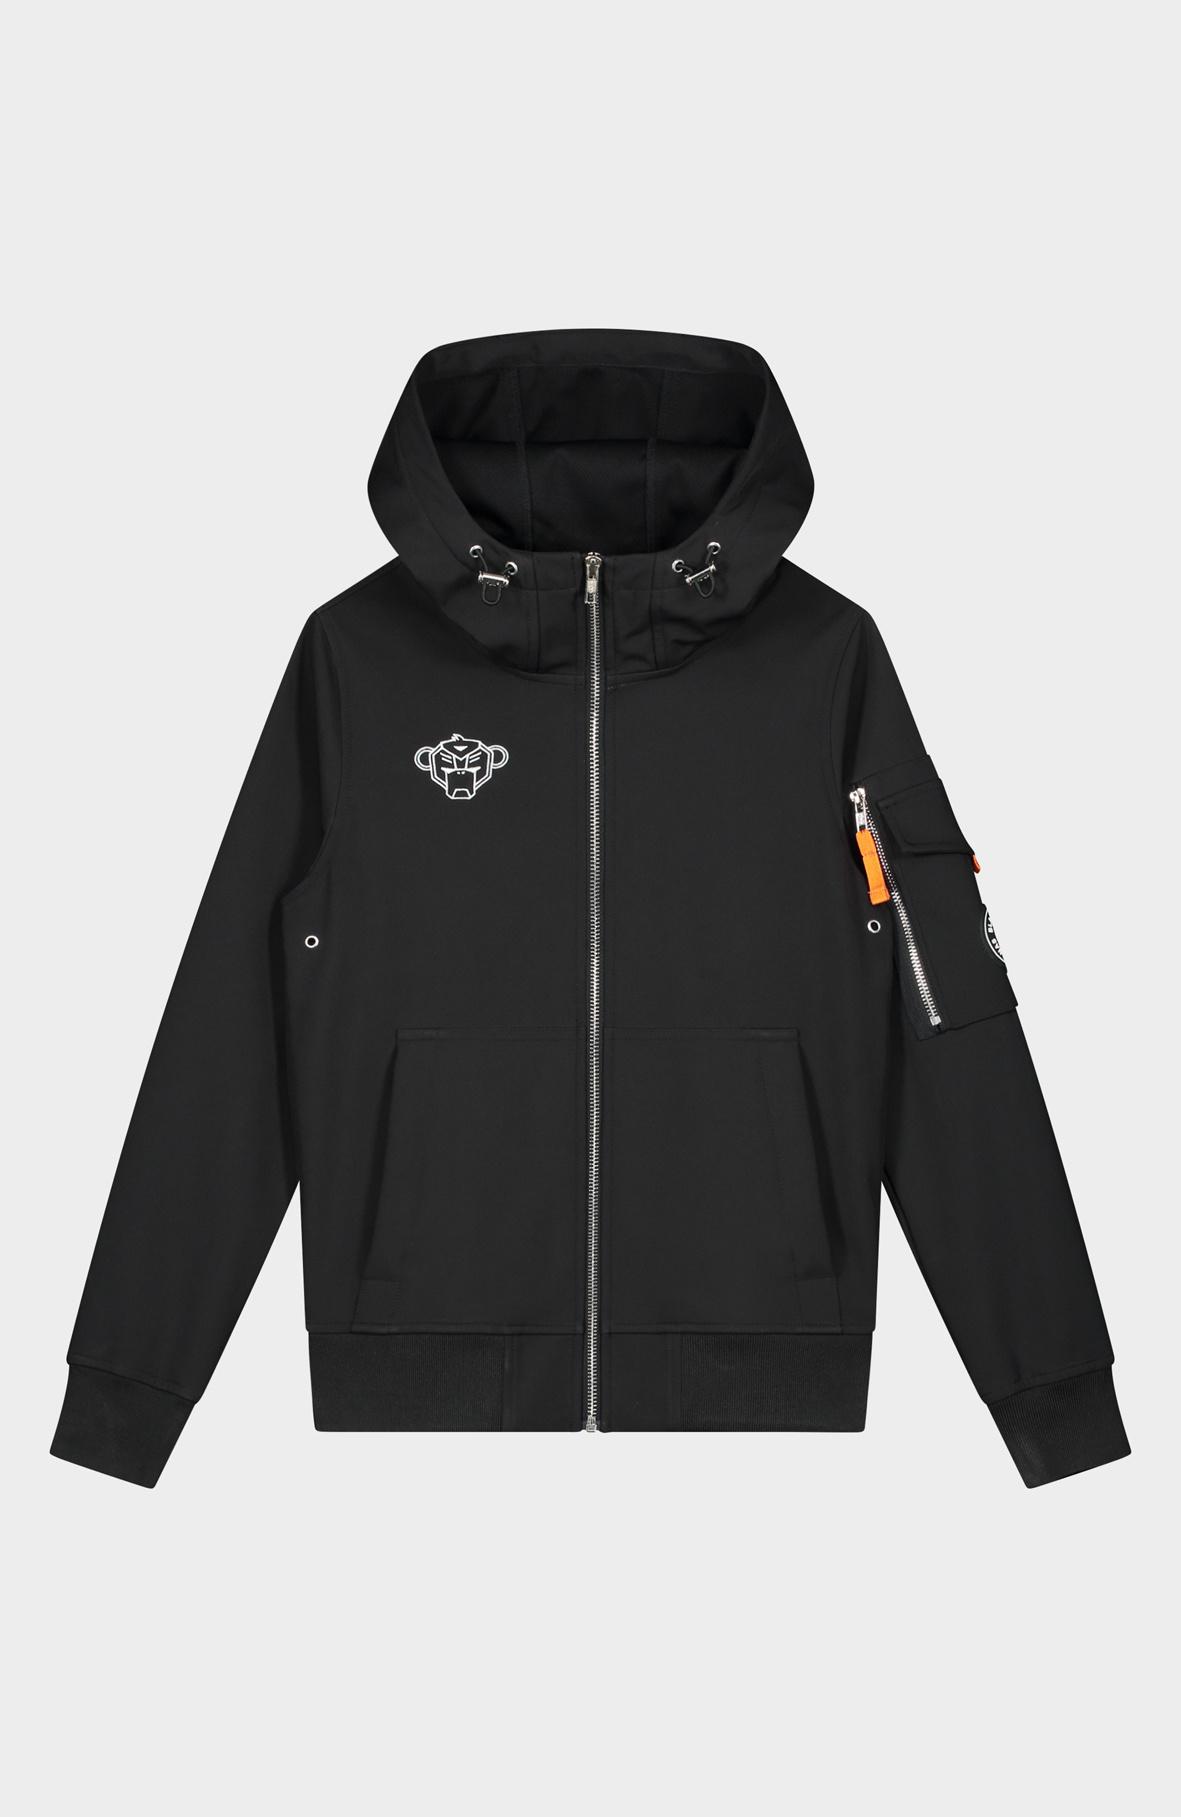 Jr. Softshell Jacket Zwart-1